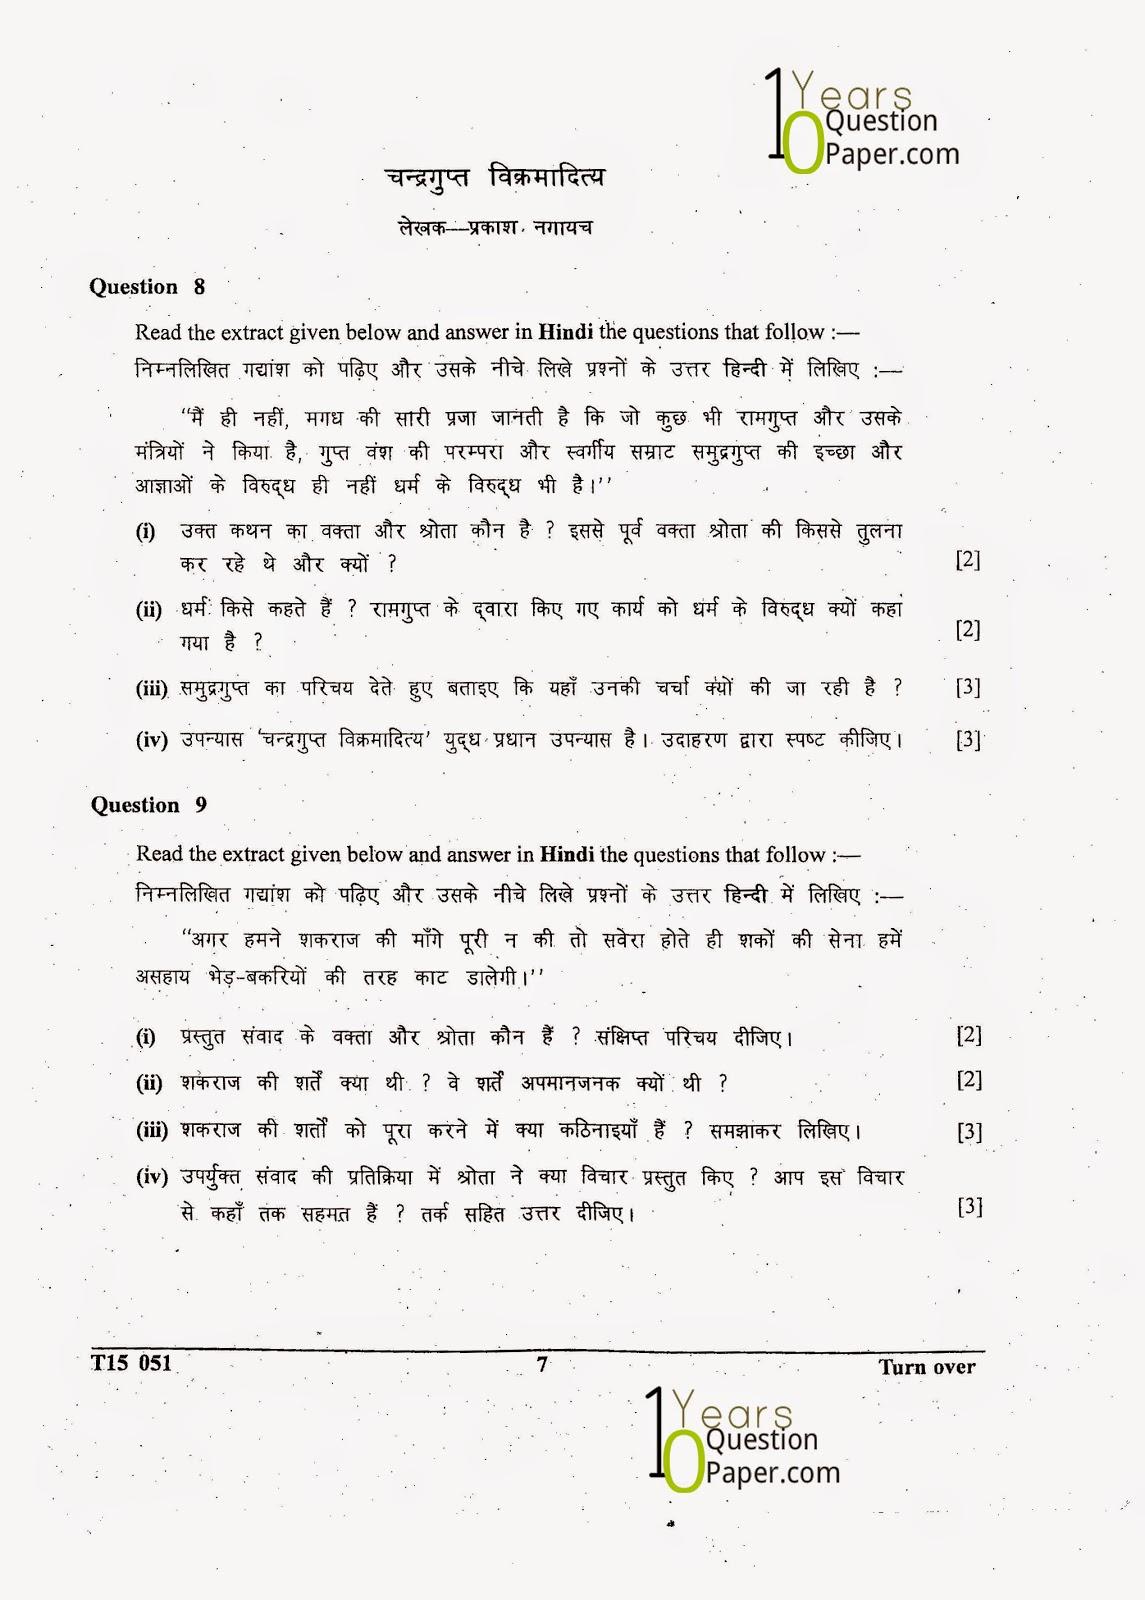 ICSE Class 10 Hindi 2015 Question Paper